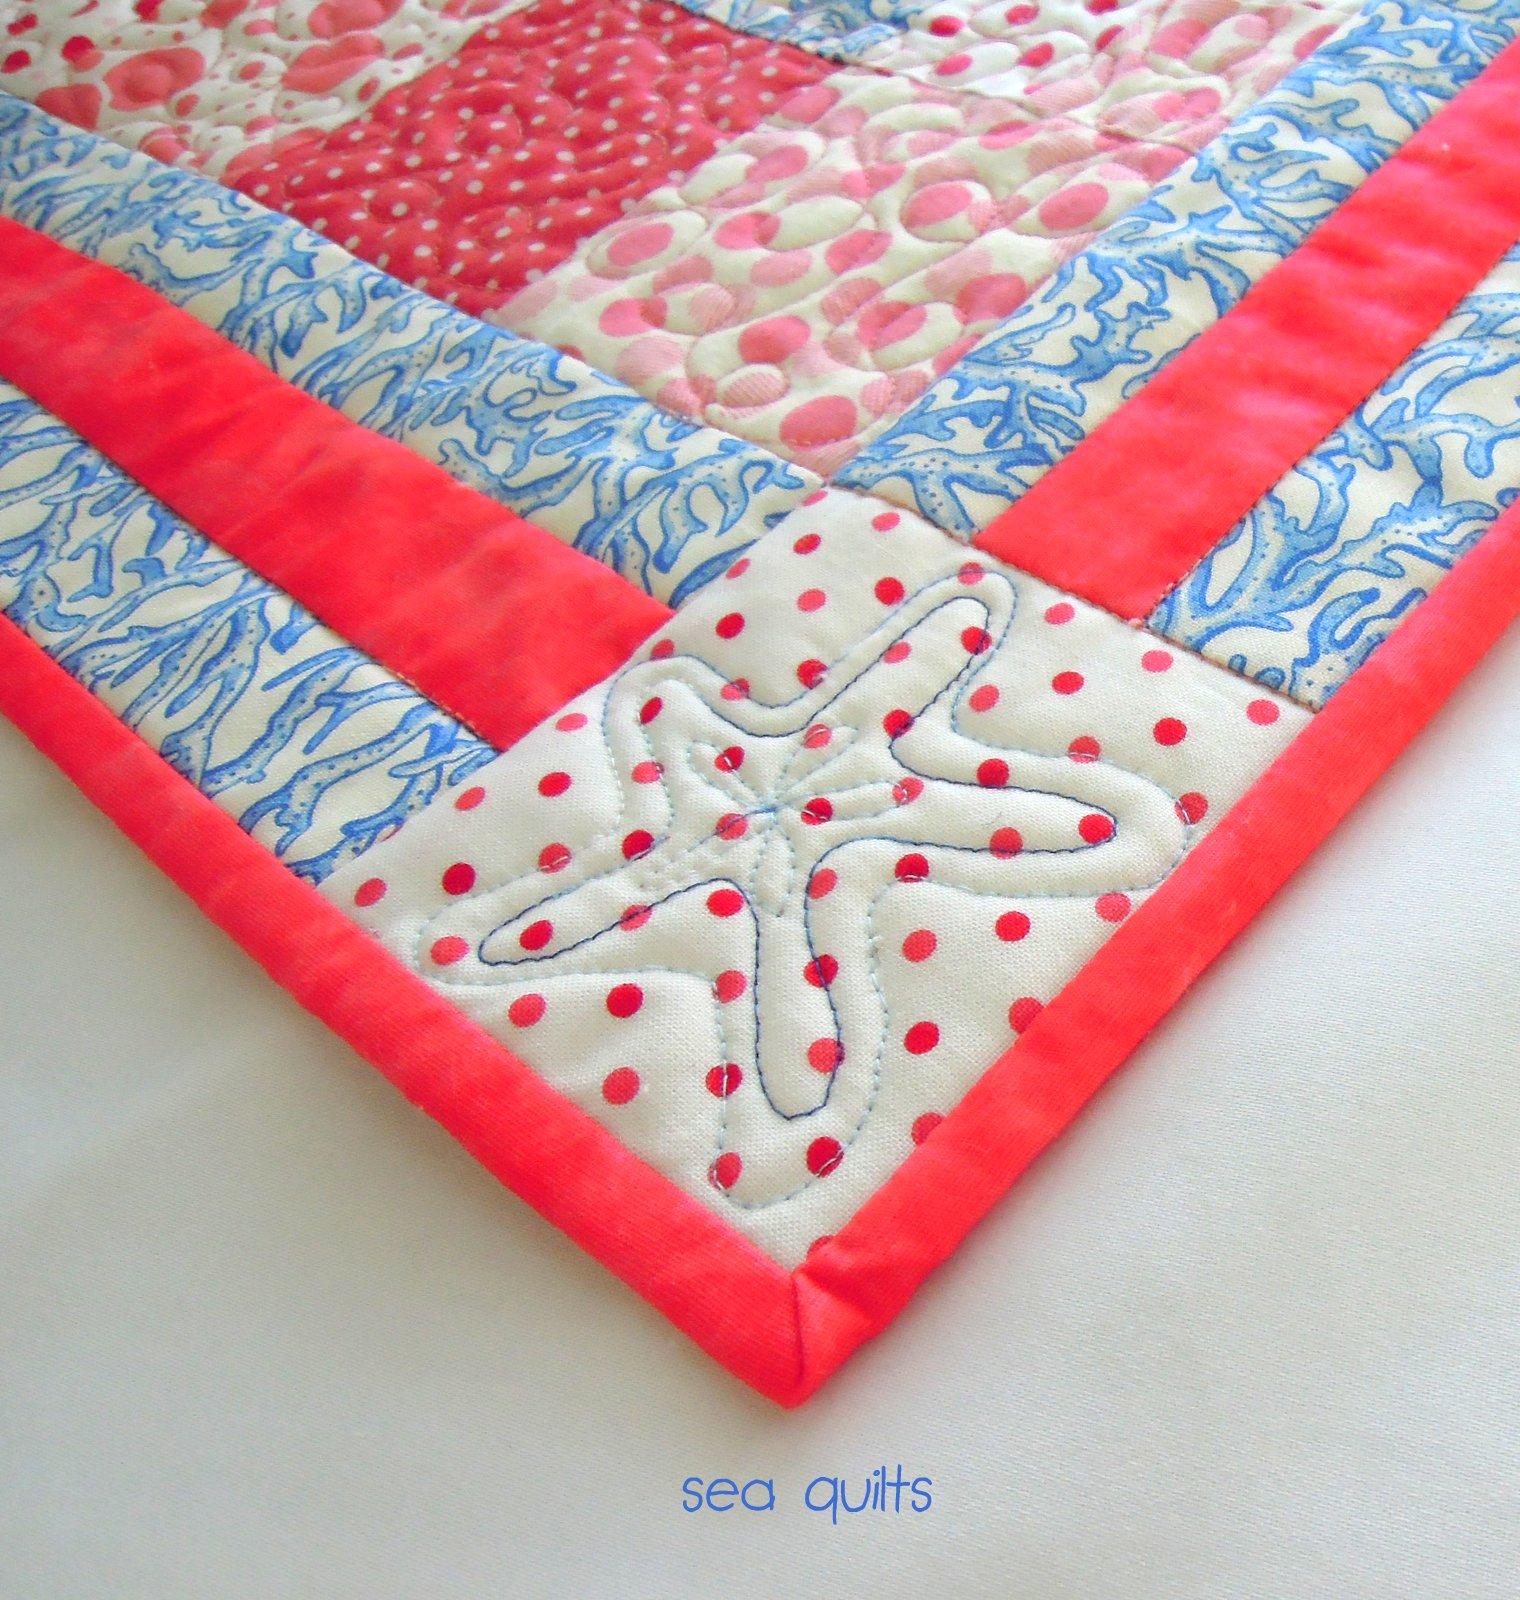 Quilt Binding Tutorial: Part One